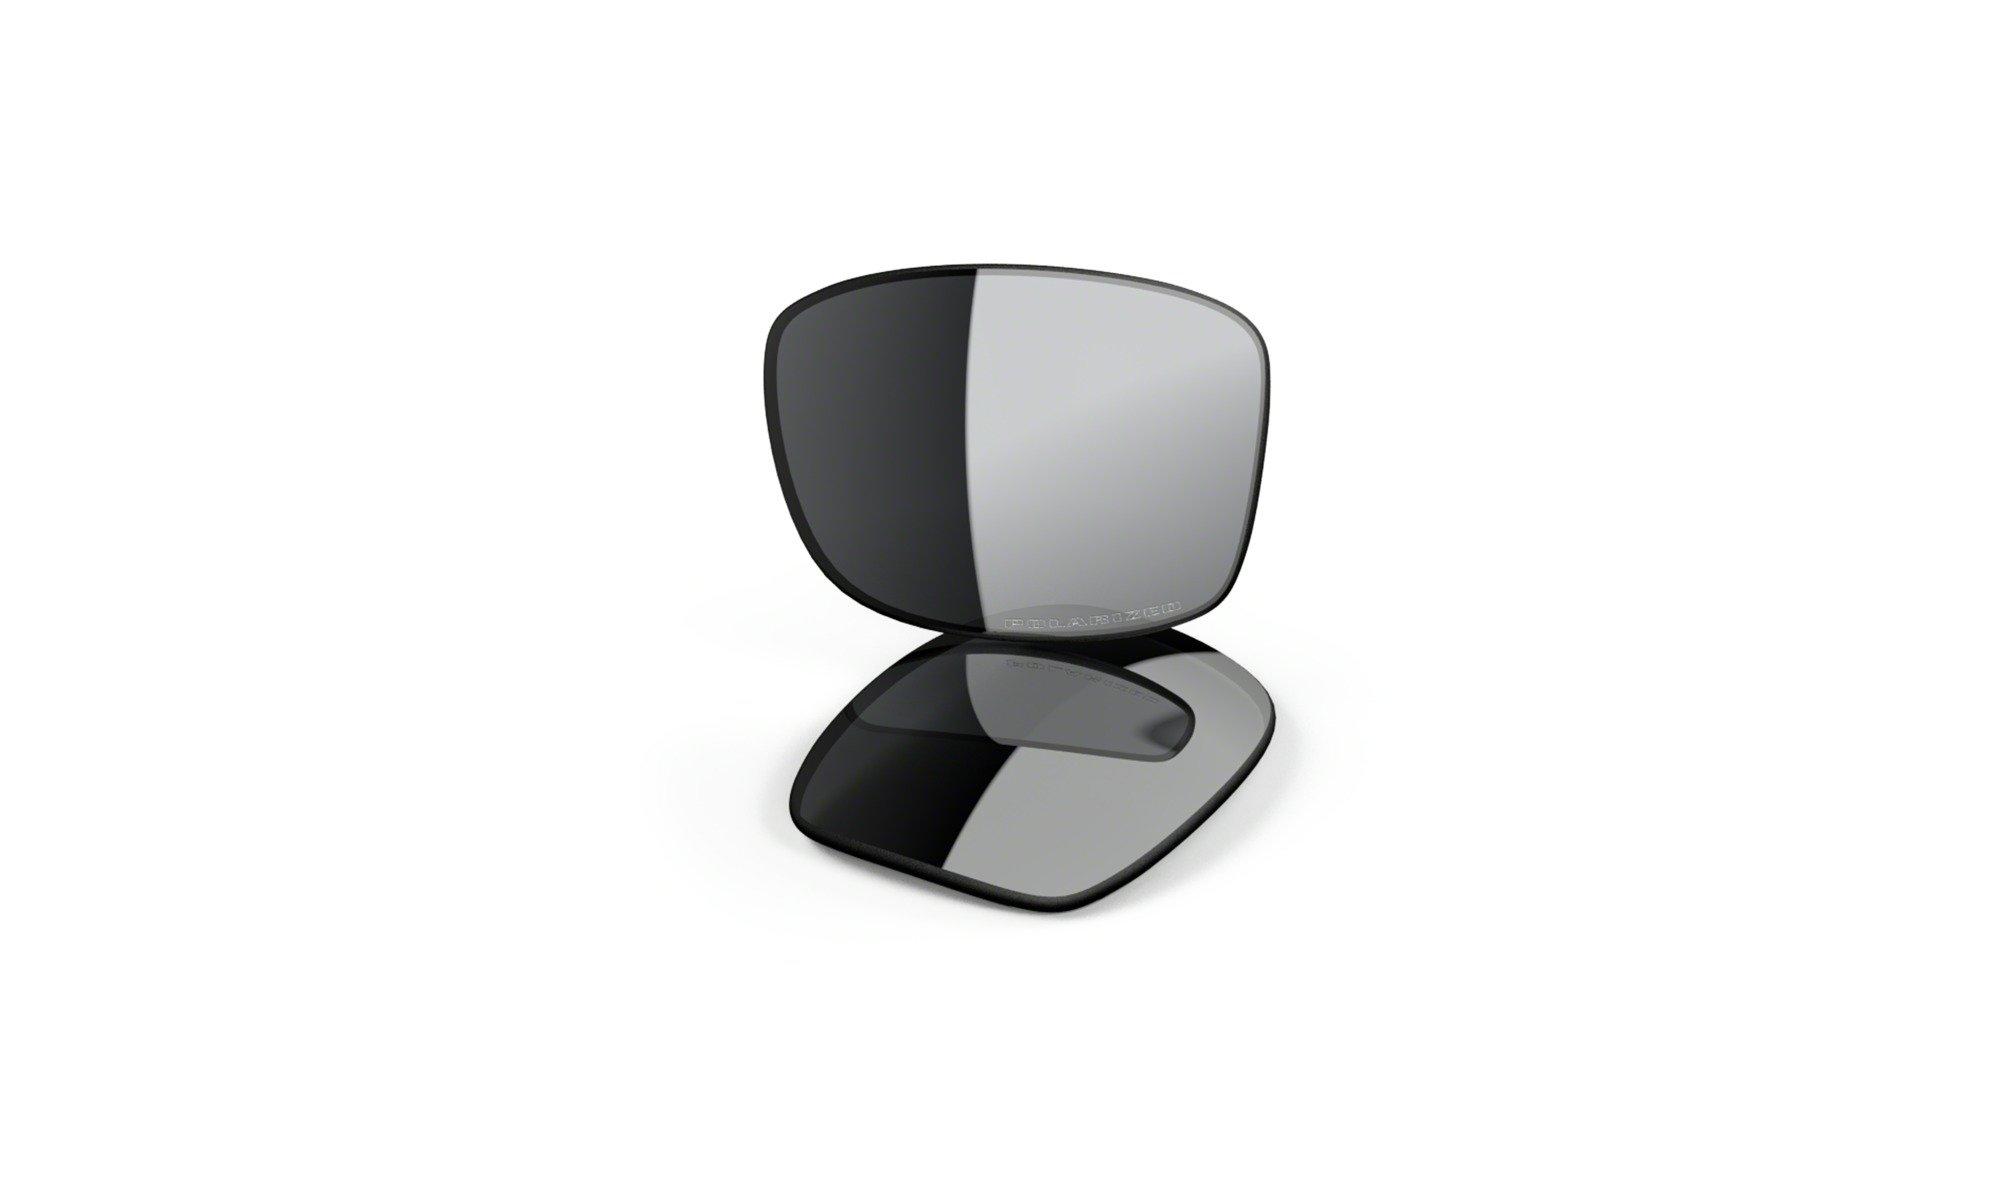 Oakley Mens Jupiter Squared Replacement Lens, Black Iridium Polarized, One Size